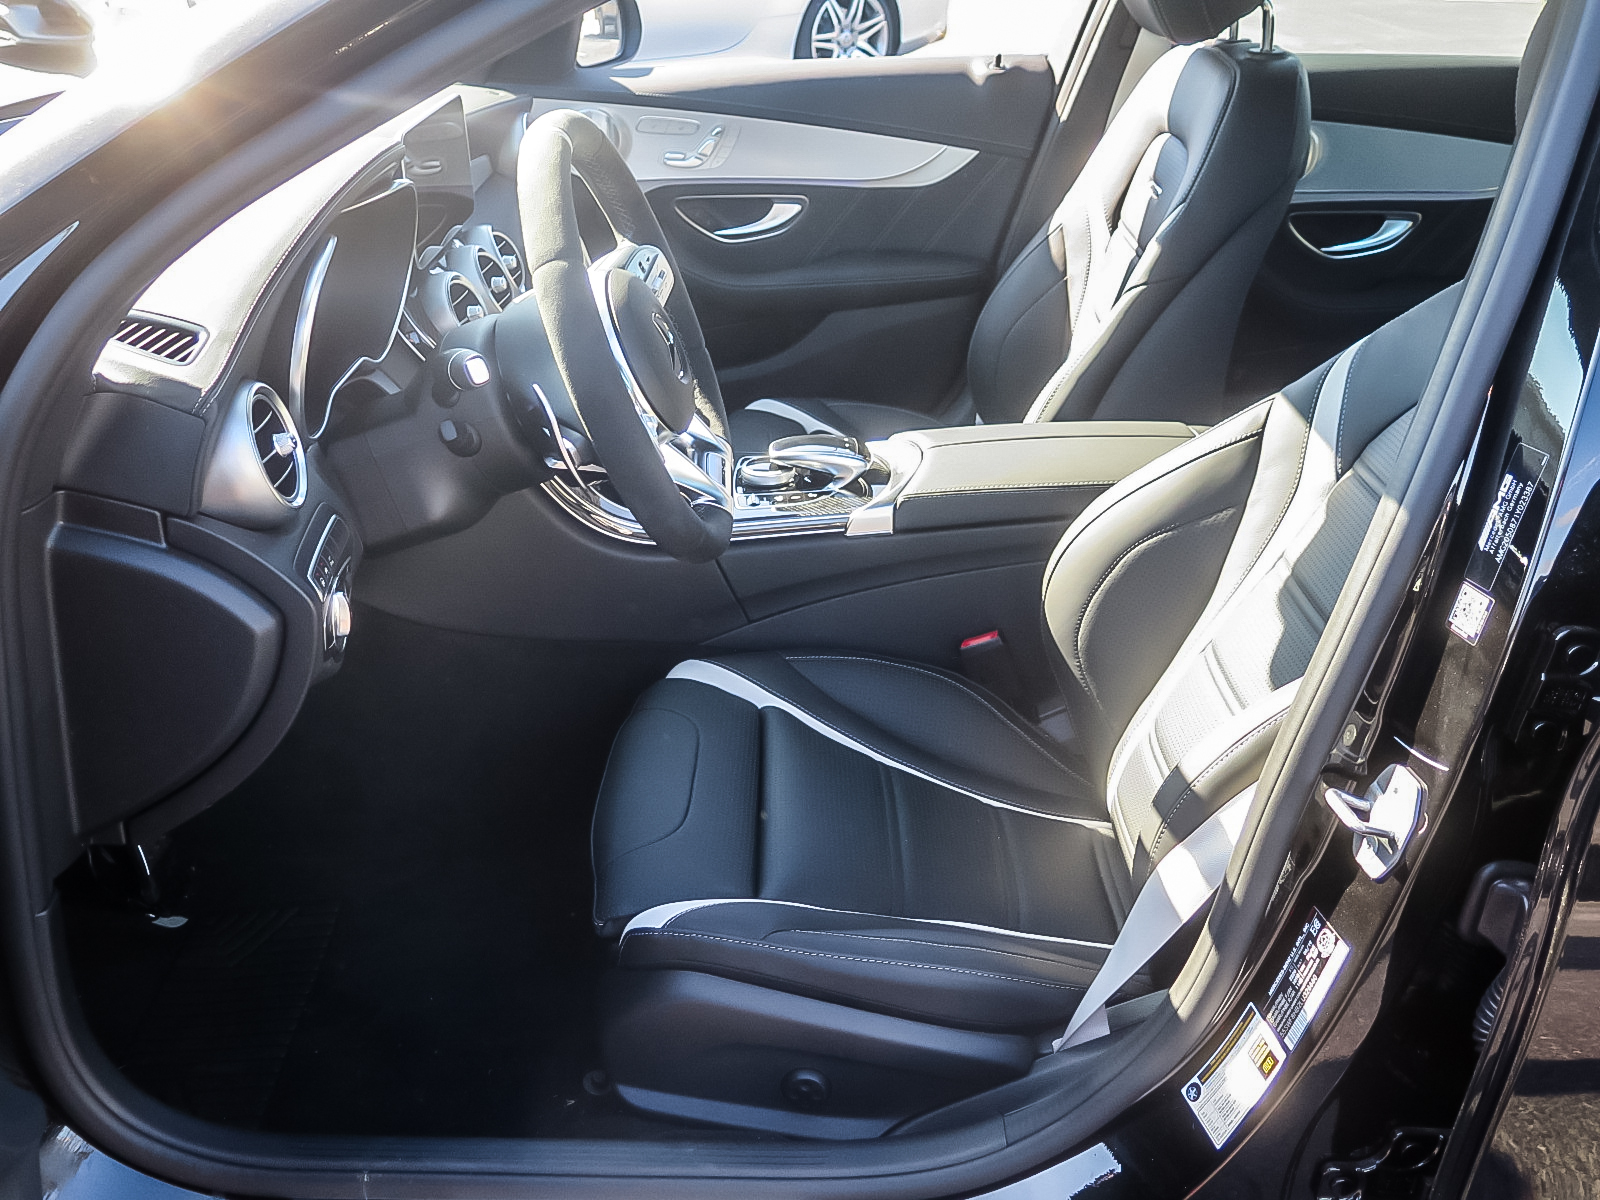 New 2020 Mercedes-Benz C63 S AMG Sedan